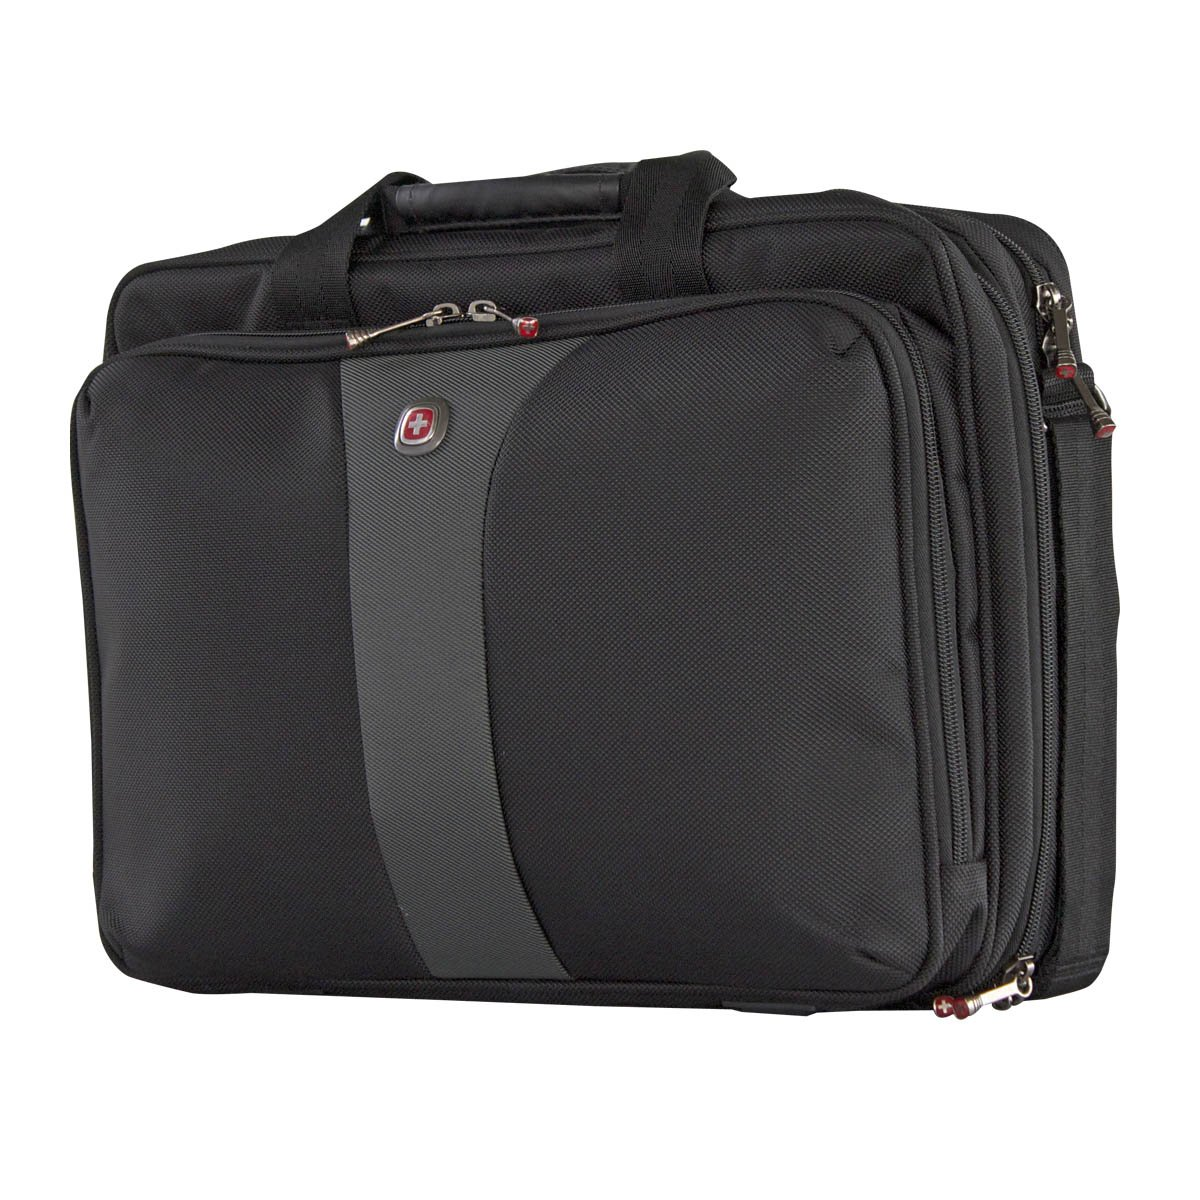 Malet n porta laptop 16 legacy negro con gris sears com - Notebook con porta parallela ...